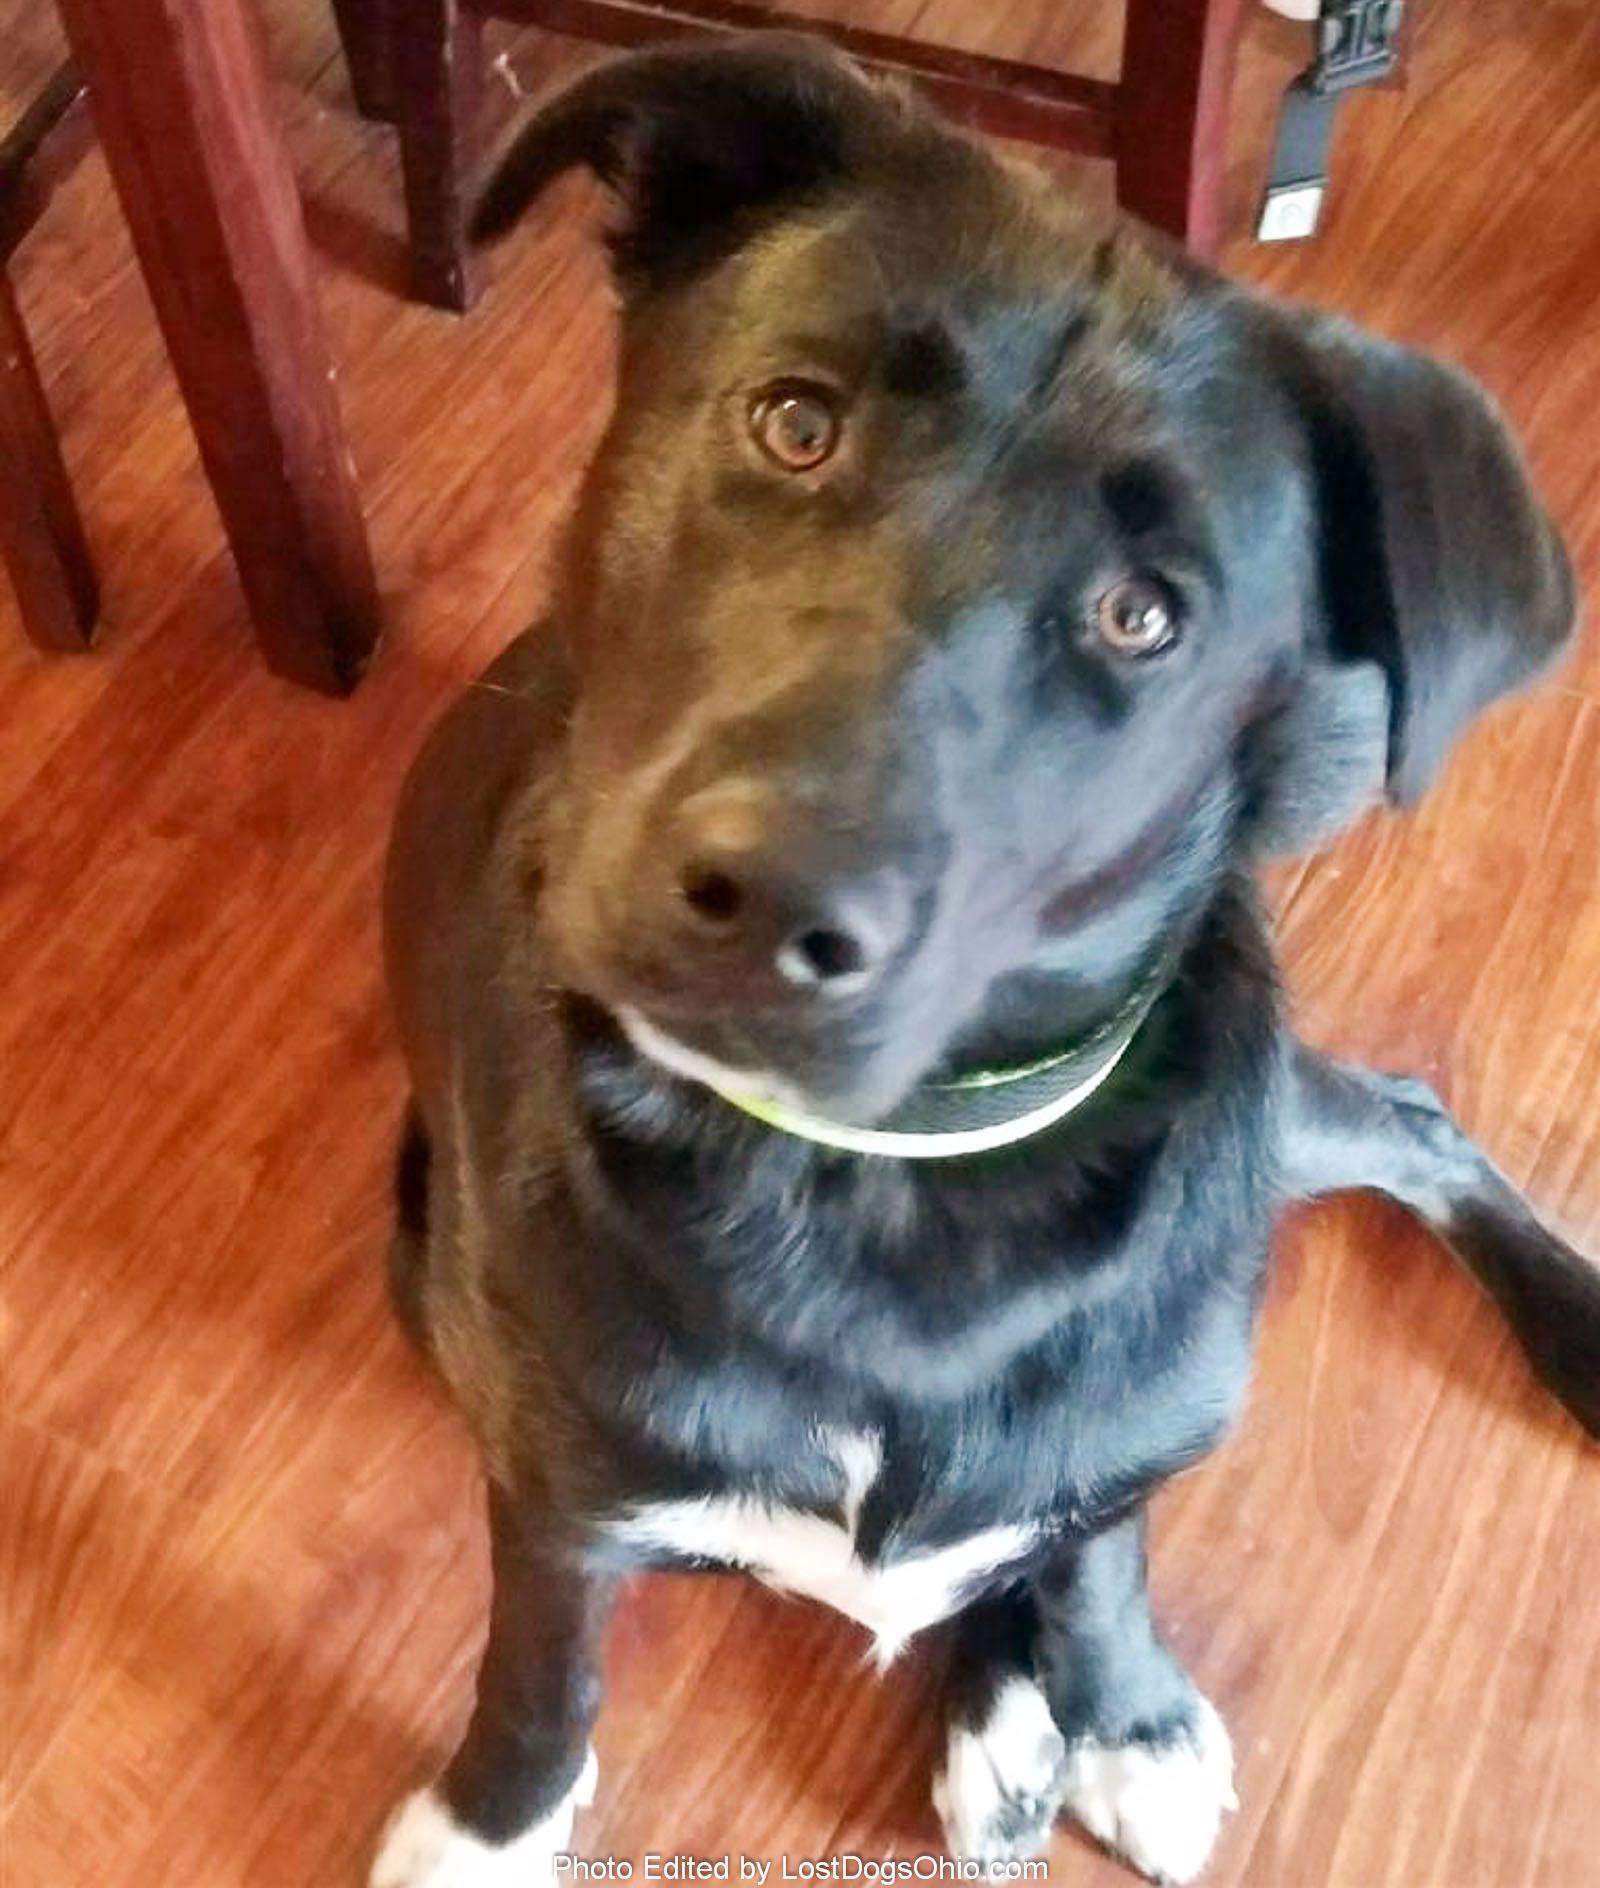 Youngstown Ohio Pets On Craigslist - DECRAIGS